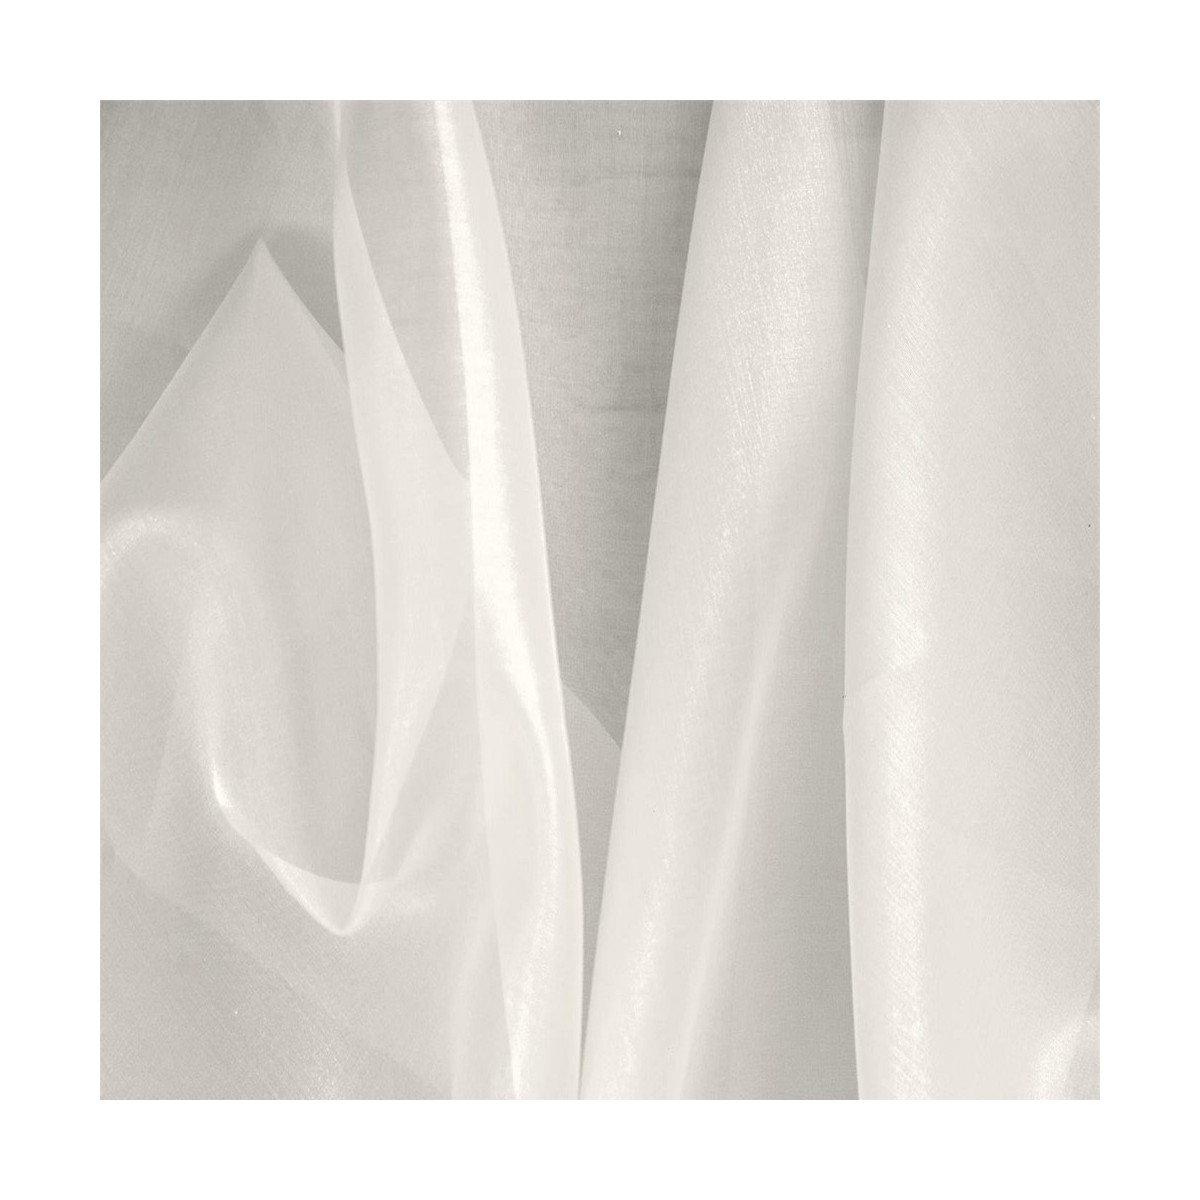 Organza di Seta Avorio 100x140cm 24g/mq